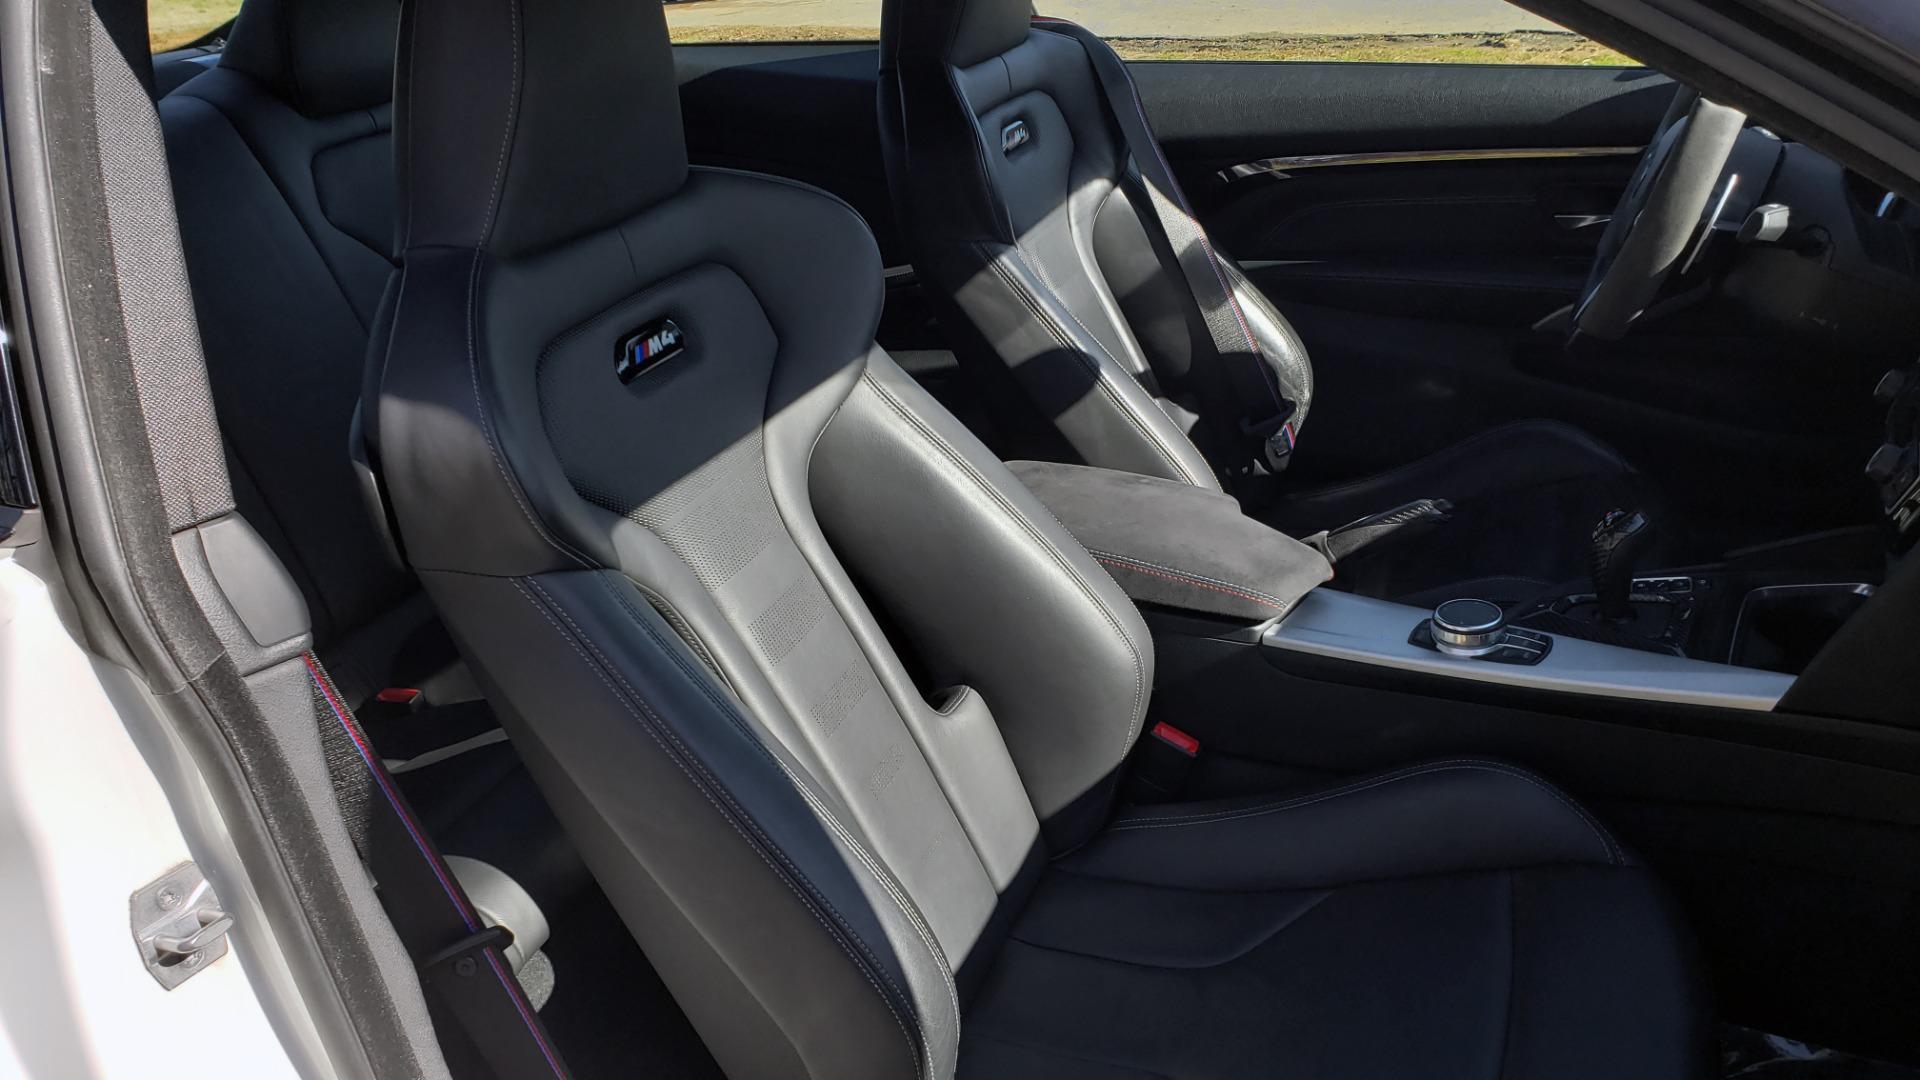 Used 2018 BMW M4 COMP PKG / EXEC / M-DRIVER / PARK CNTRL / ACTIVE BLIND SPOT for sale Sold at Formula Imports in Charlotte NC 28227 68